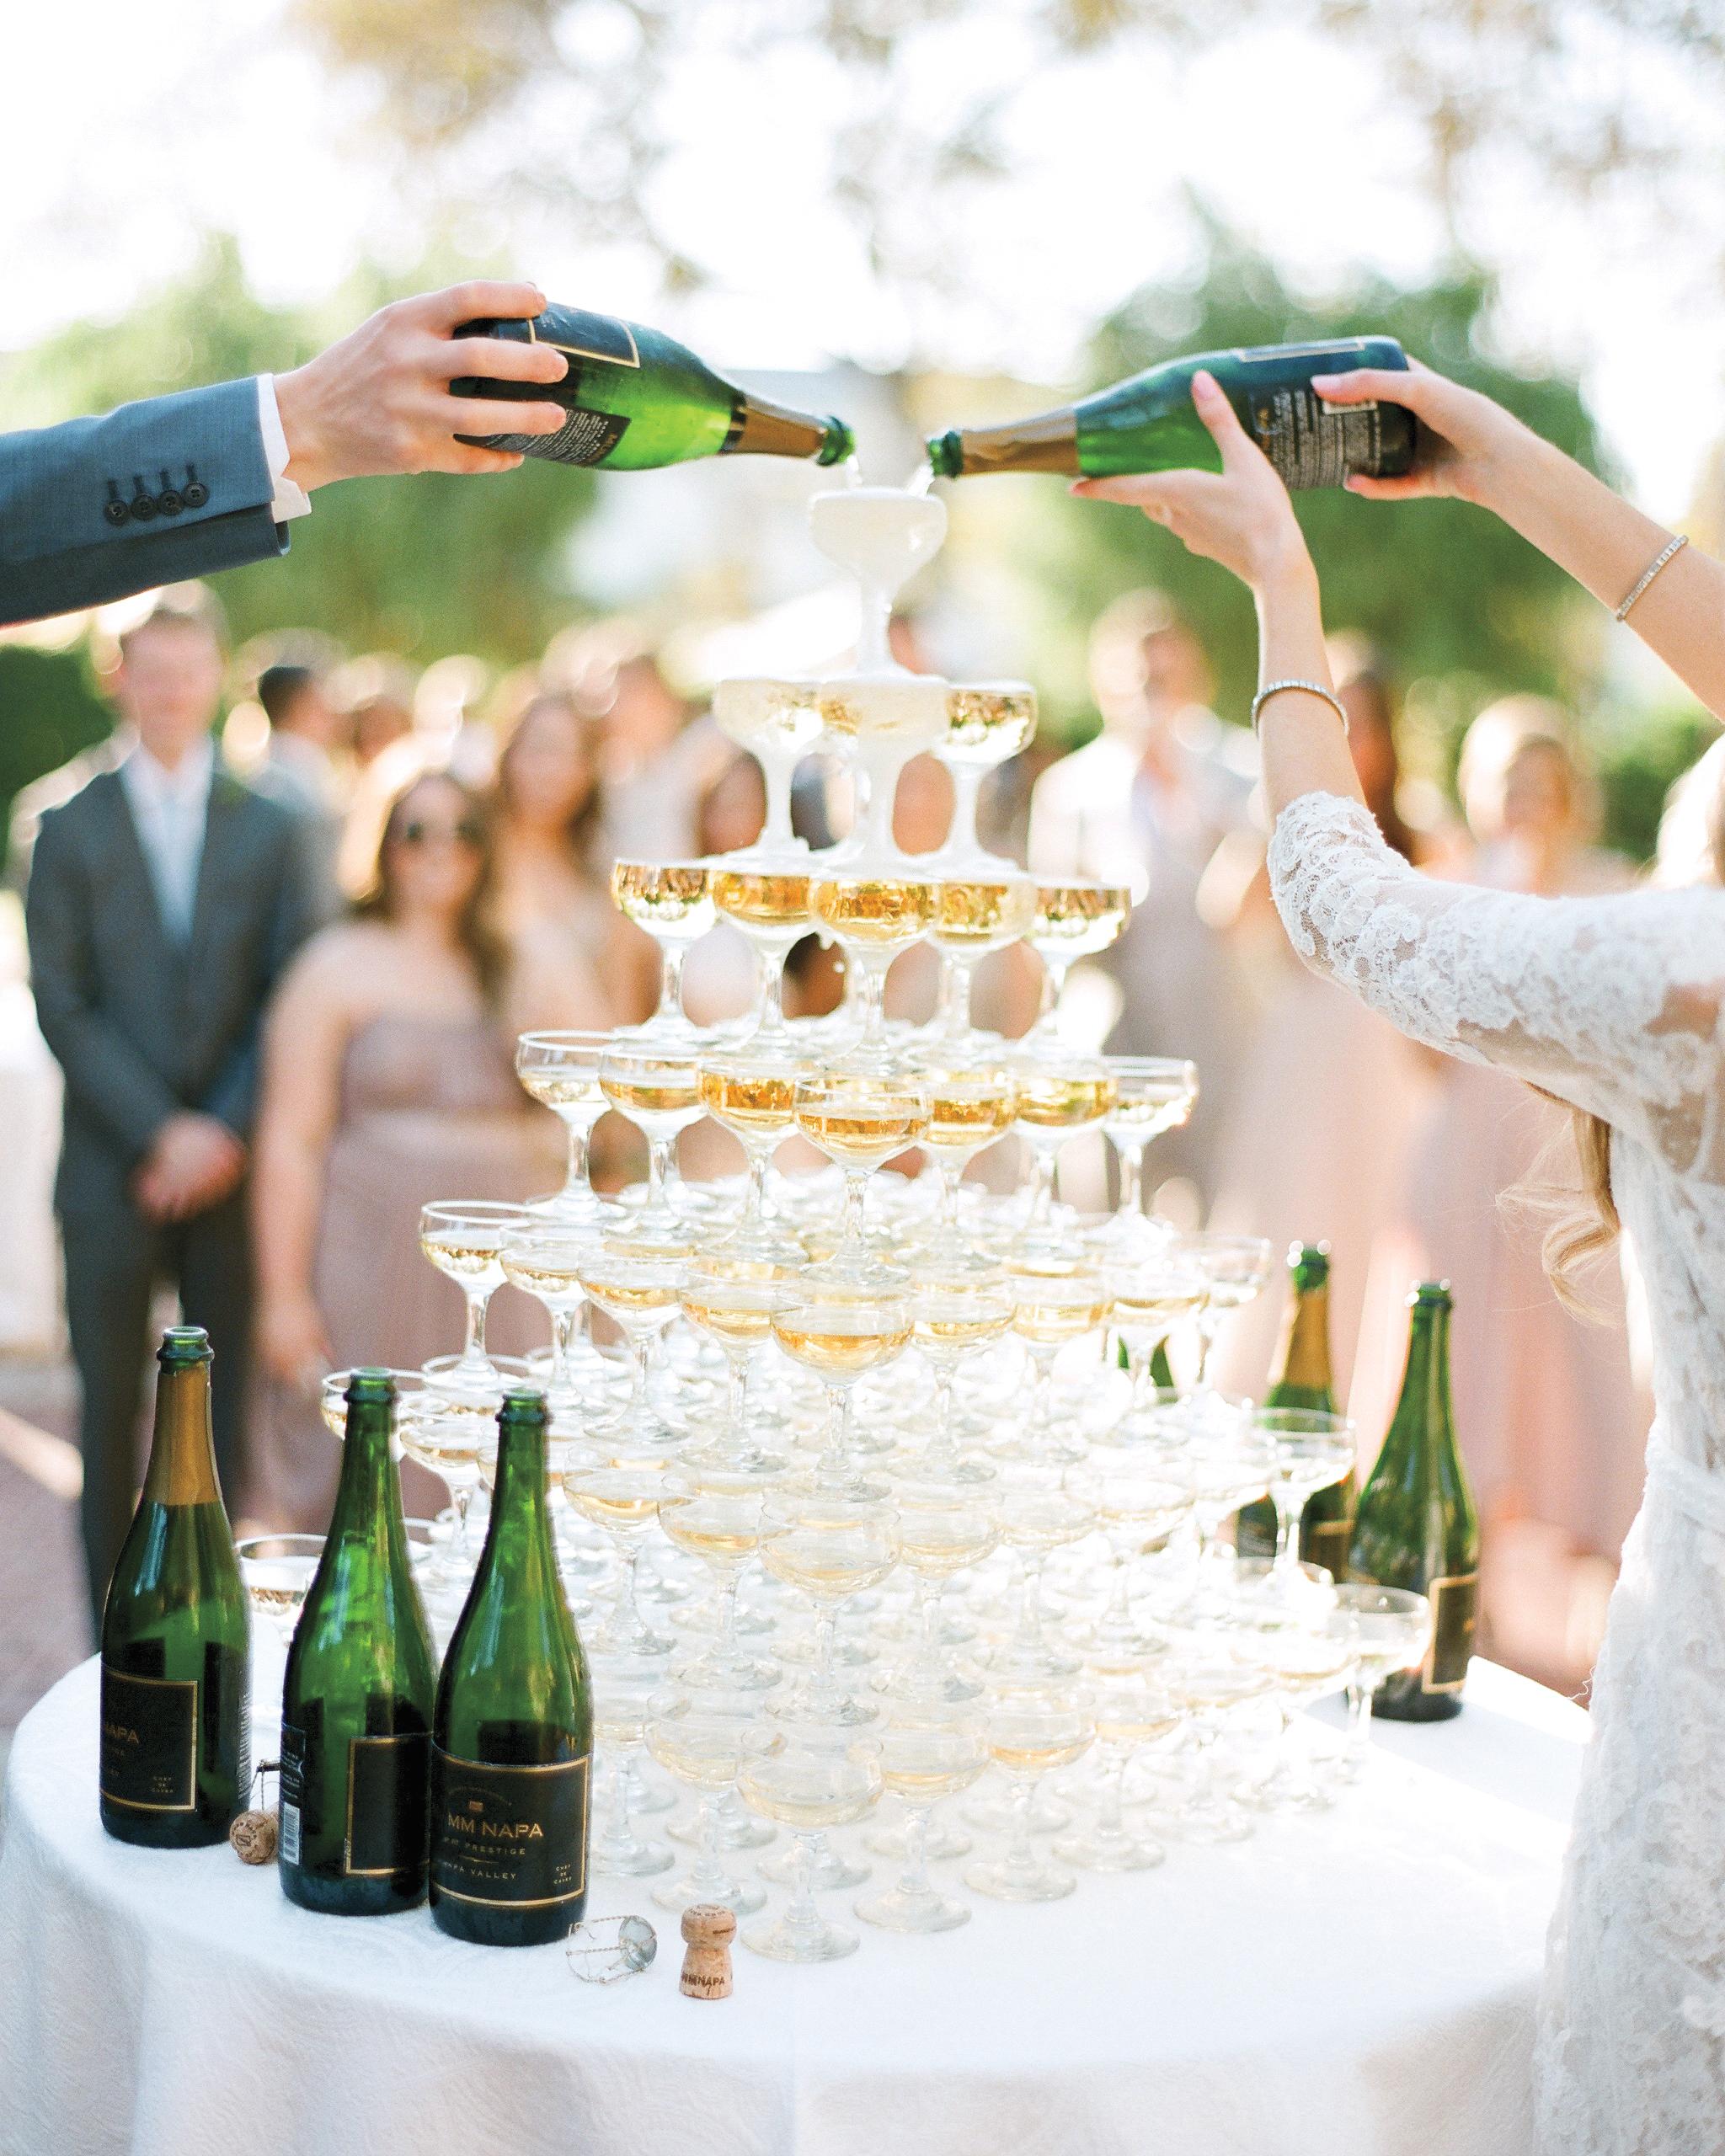 lily-jonathan-wedding-california-65670001-s112482.jpg